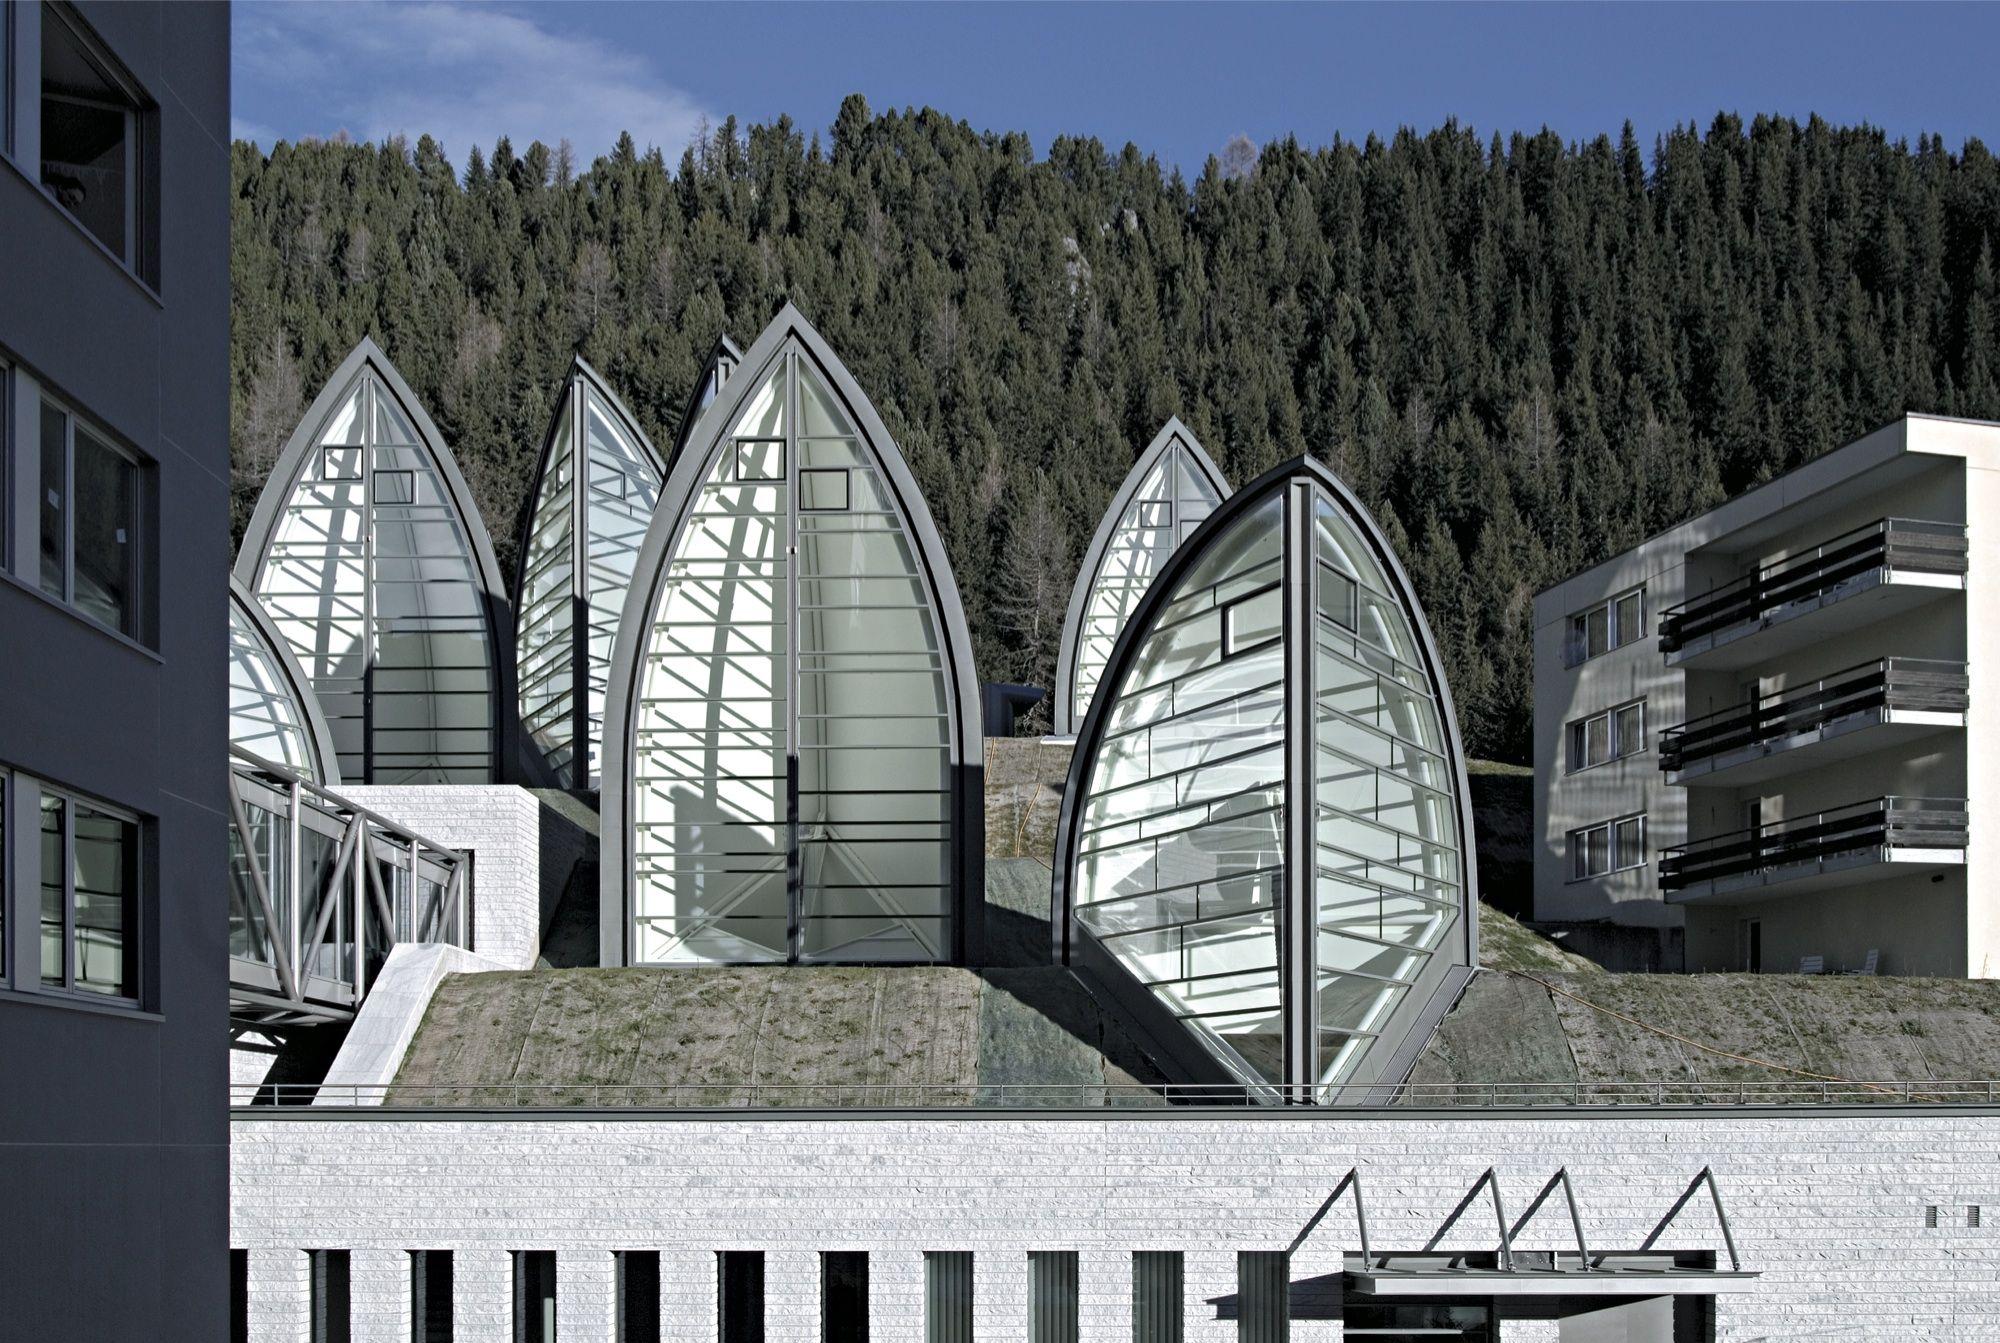 ماریو بوتا Tschuggen Grand Hotel 61